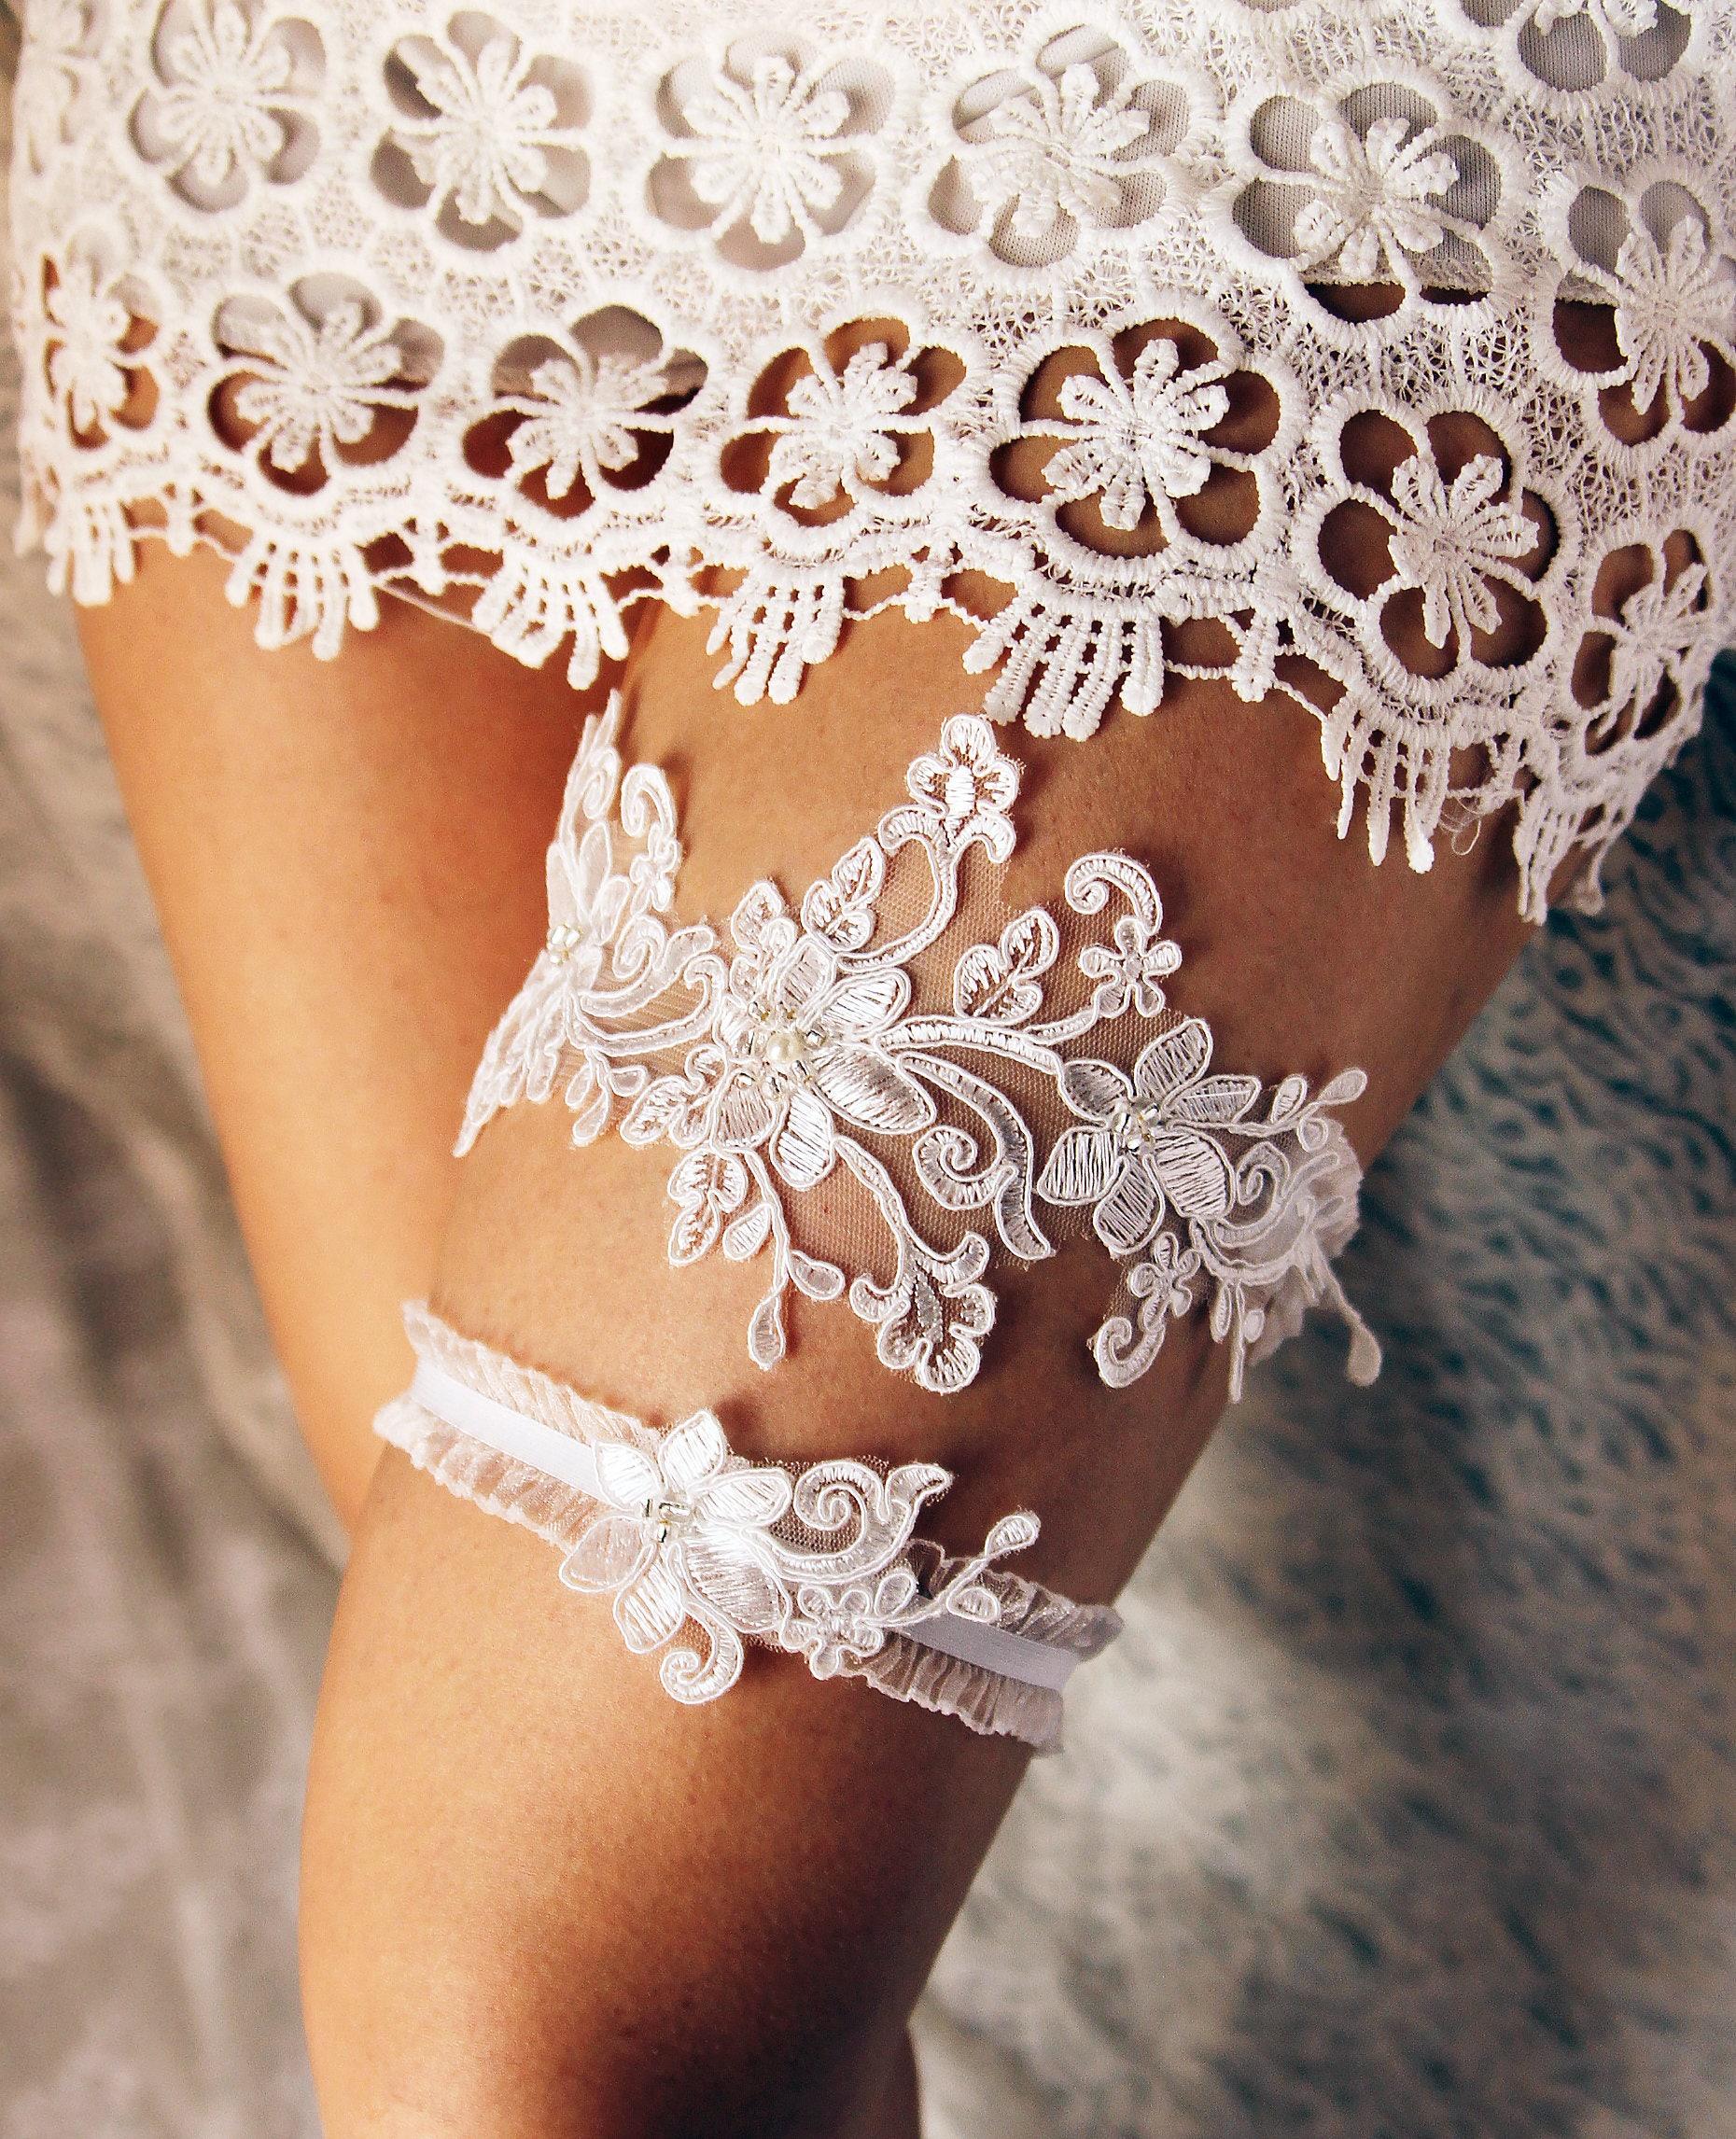 Personalized Wedding Garter Sets: Wedding Garter Lace Garter Set Bridal Garter Belt Rustic